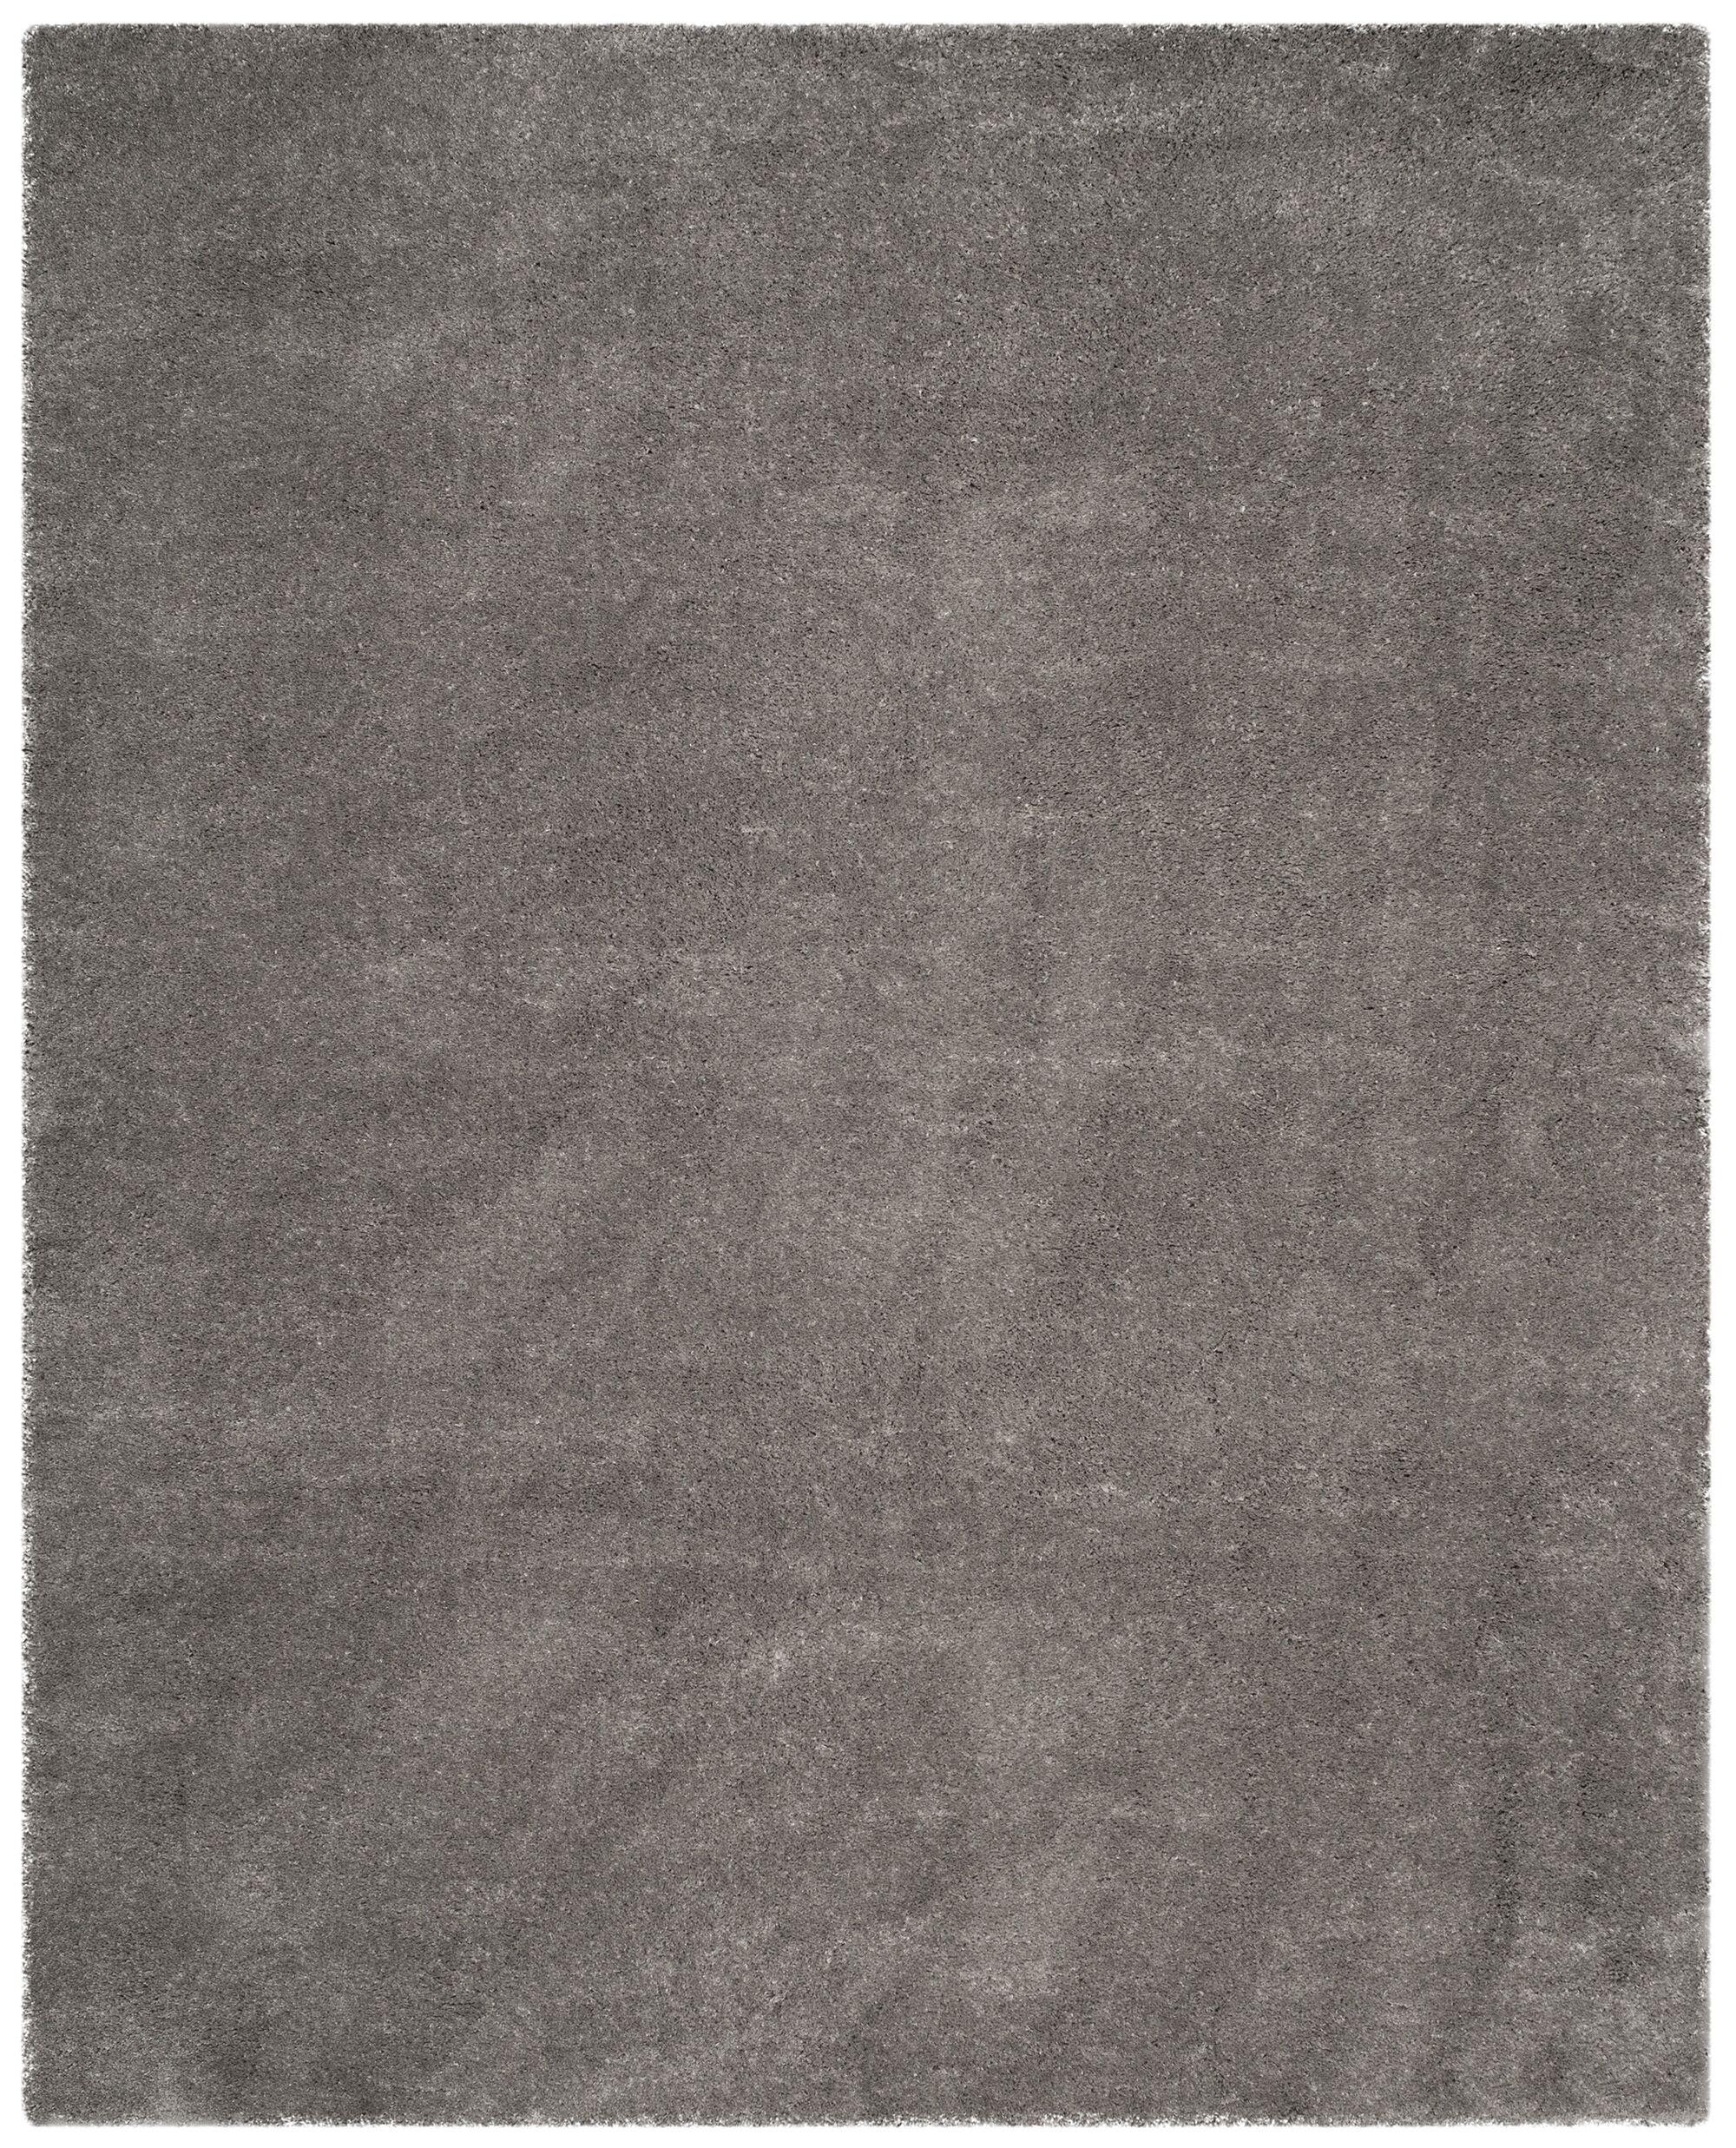 Schmitt Gray Area Rug Rug Size: Rectangle 8' x 10'